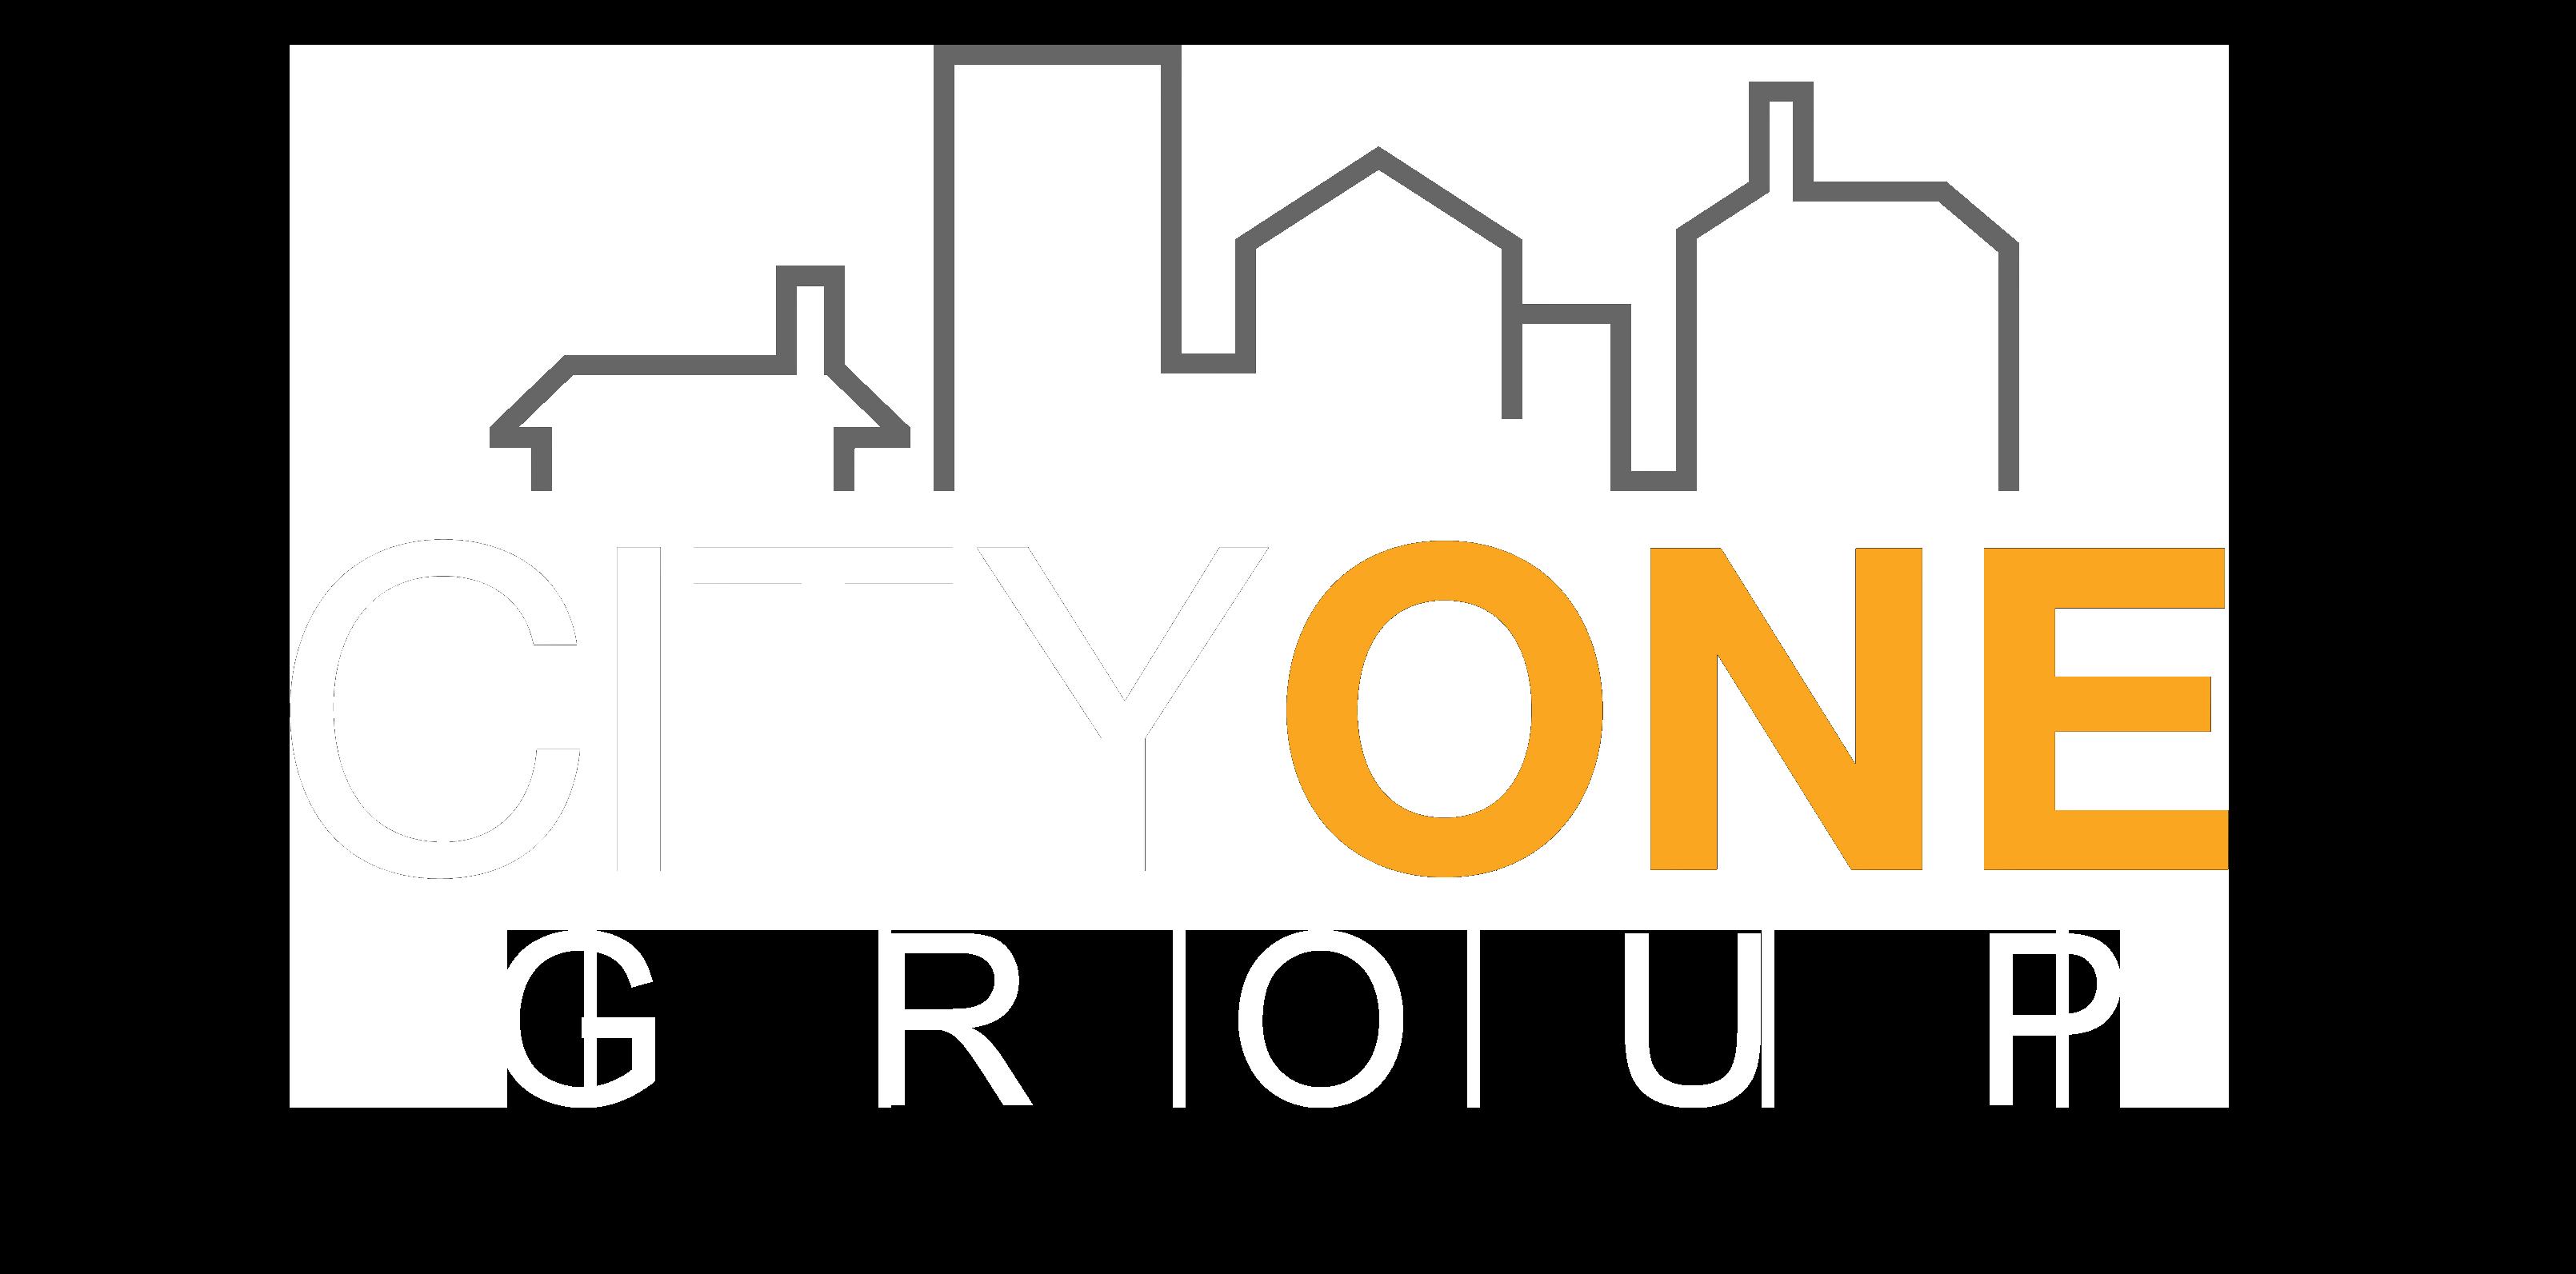 cityonegroup logo